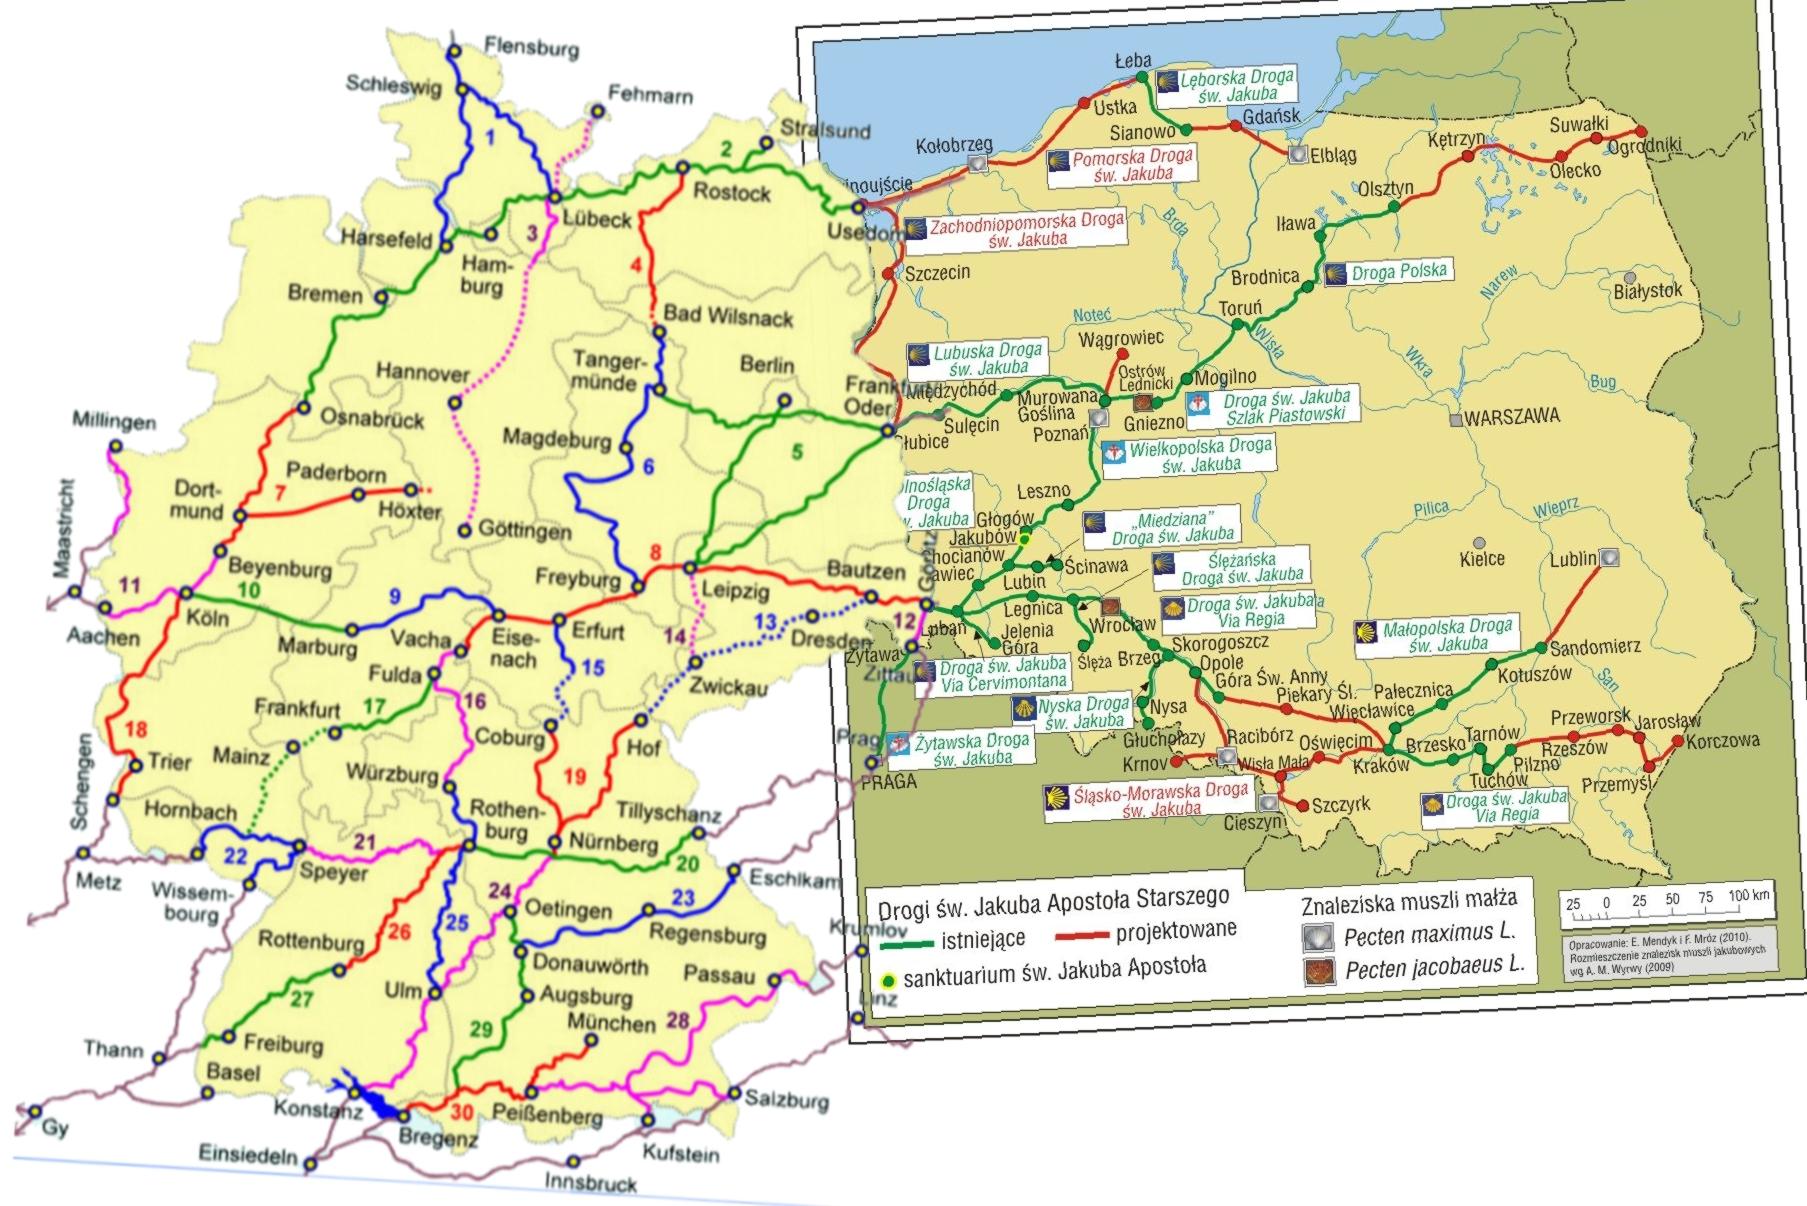 Camino De Santiago Forum Tylko Rowerem Z Polski Do Santiago